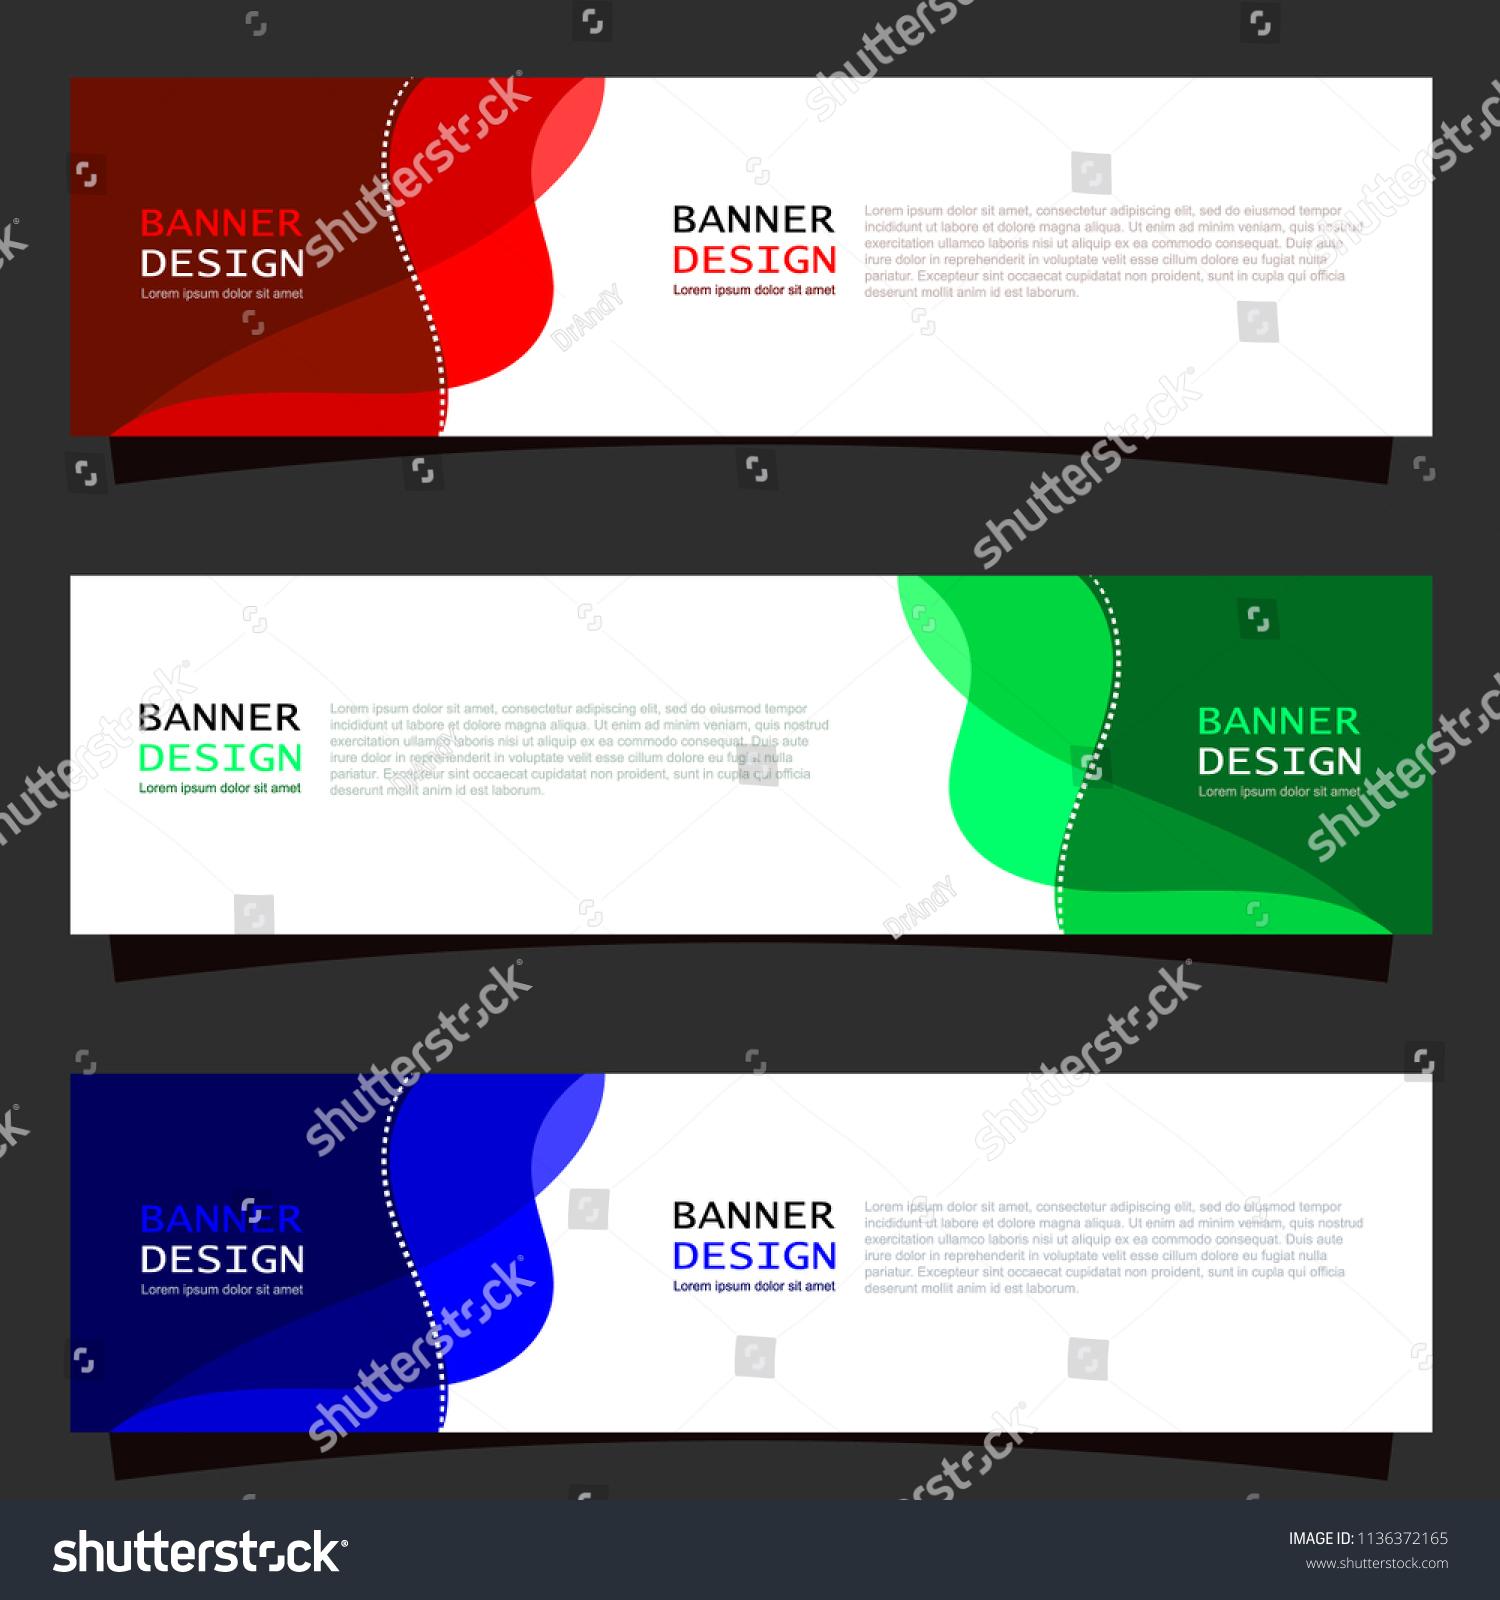 creative abstract banner template website header のベクター画像素材